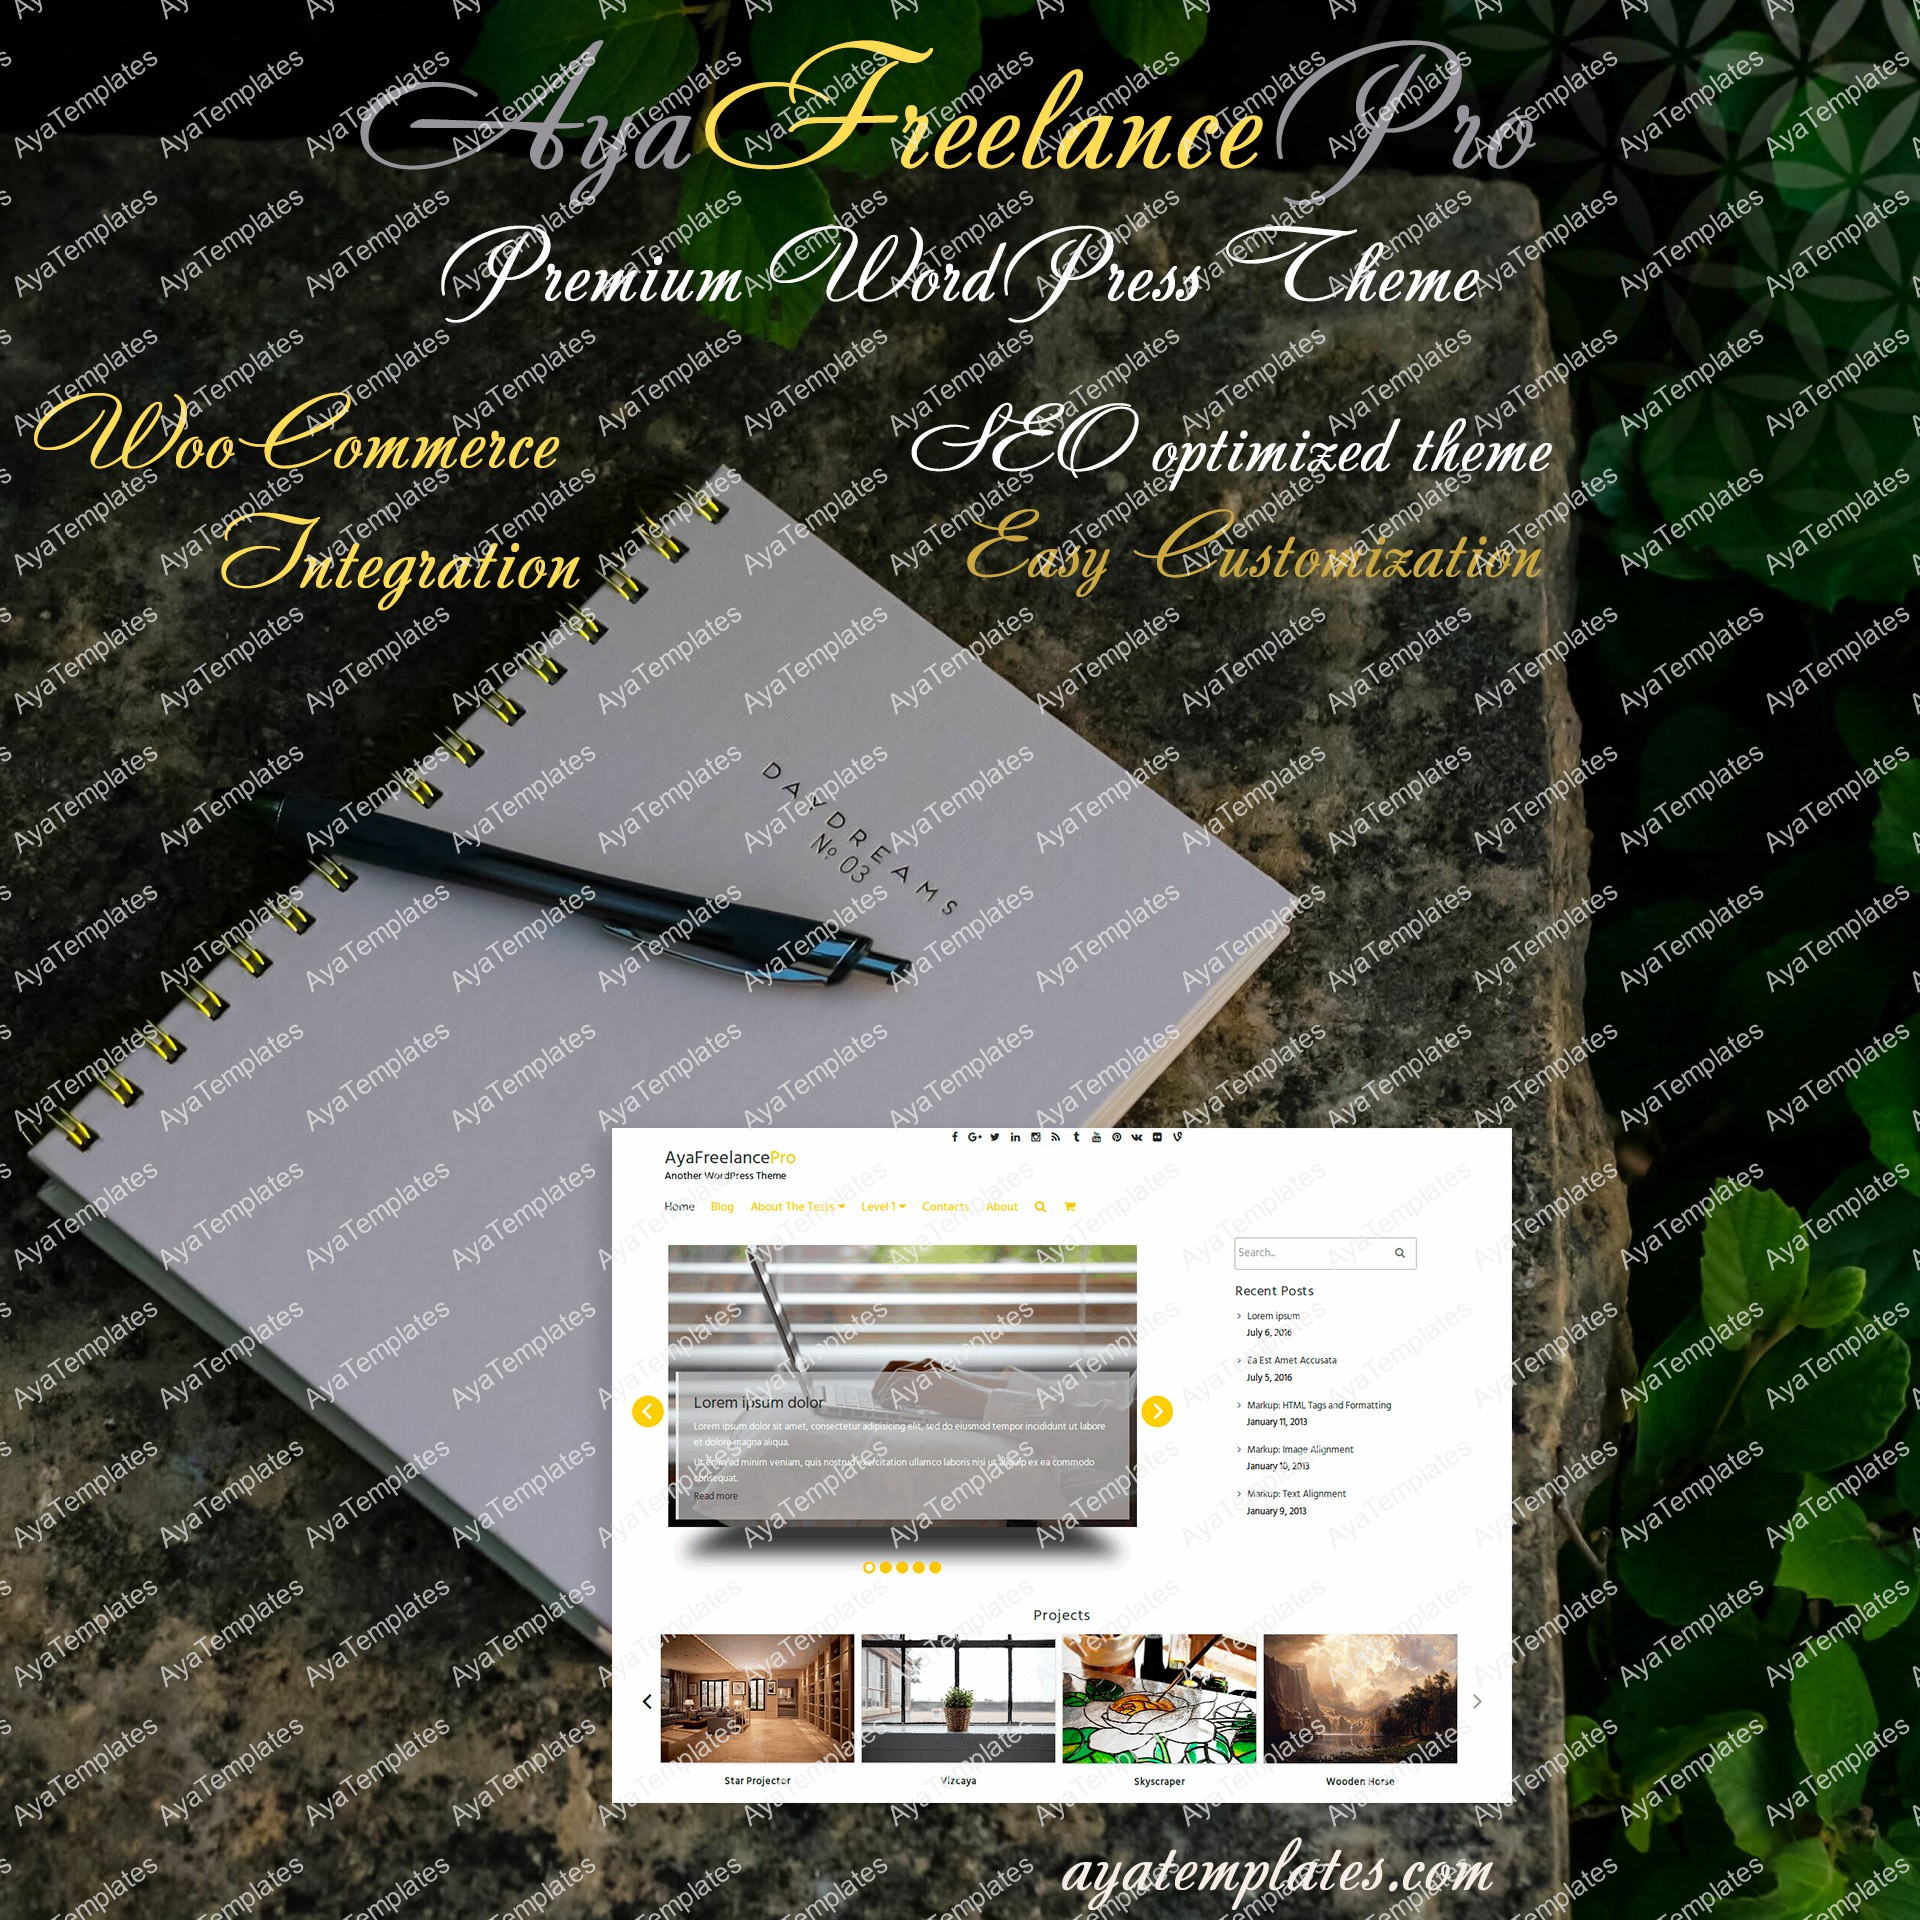 ayafreelancepro-premium-wordpress-theme-mockup-ayatemplates-com